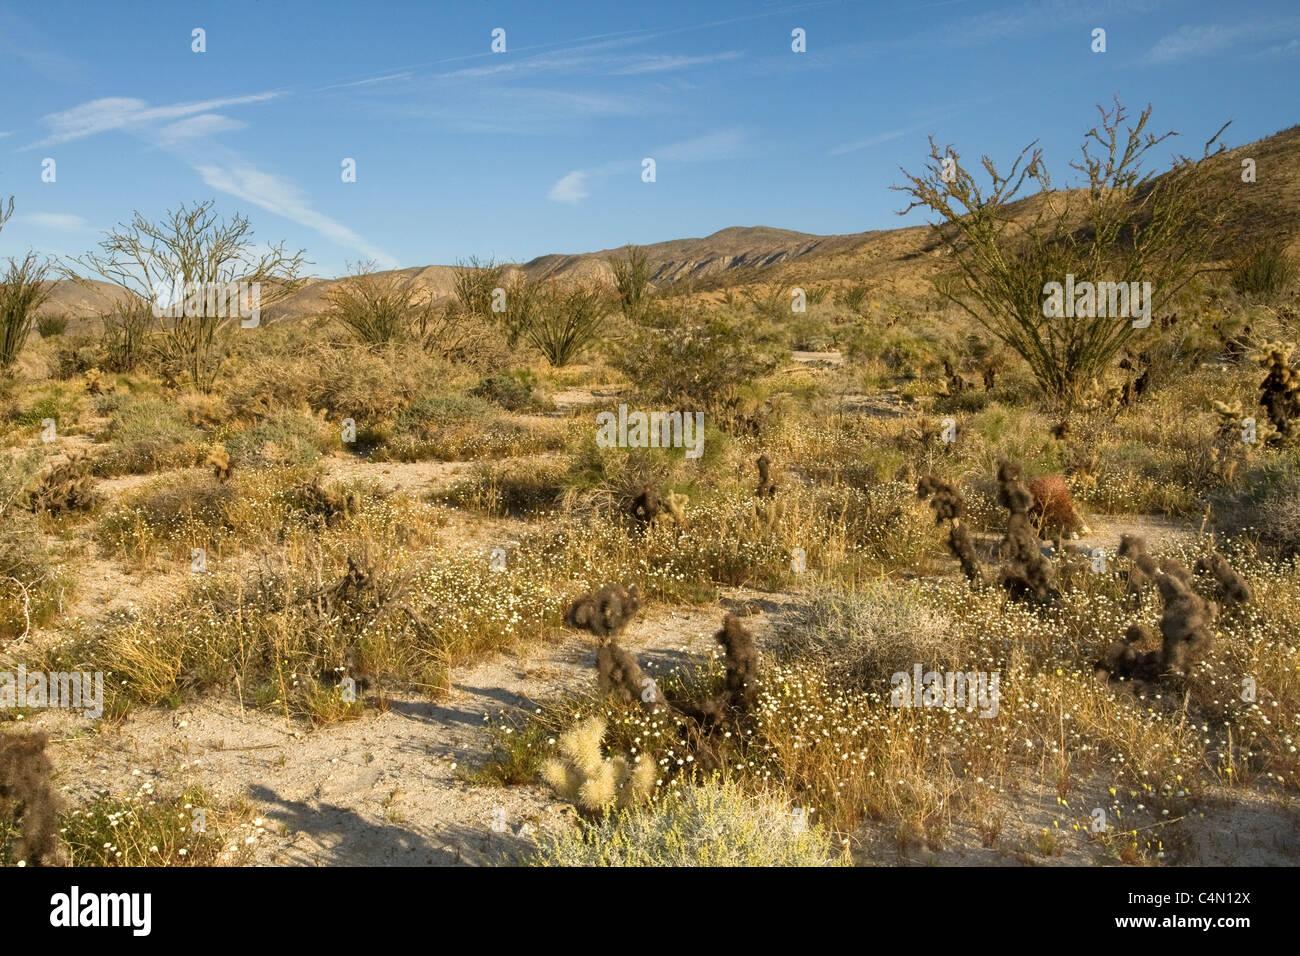 Anza Borrego Desert State Park, California. - Stock Image